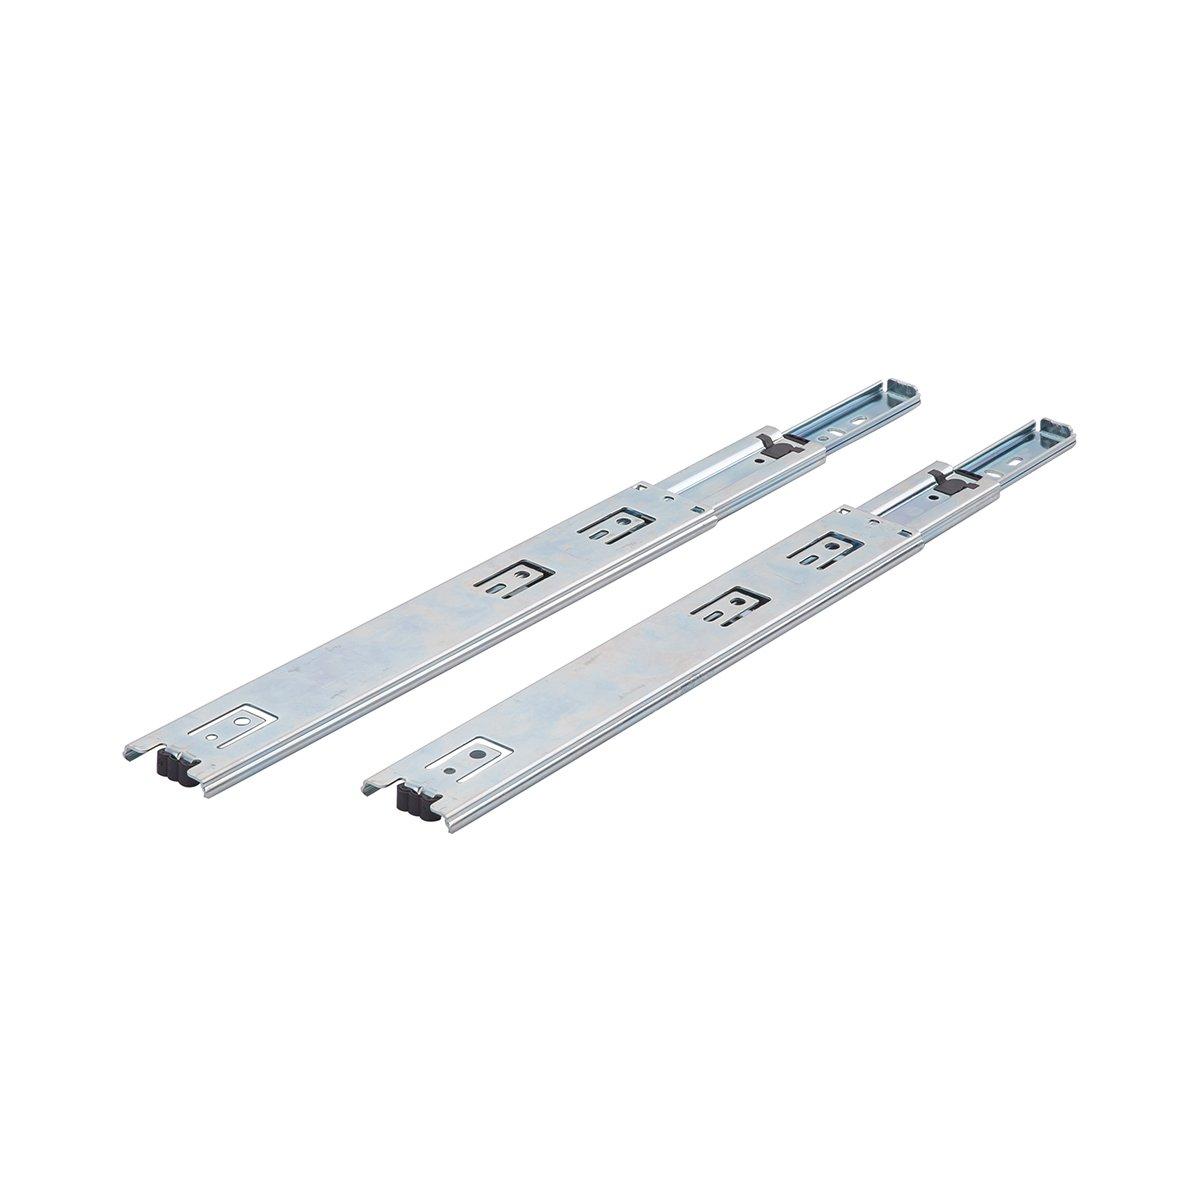 1-Pair 10 AB-5000 Nickel Plated-Steel 10 Basics Ball Bearing Drawer Slides